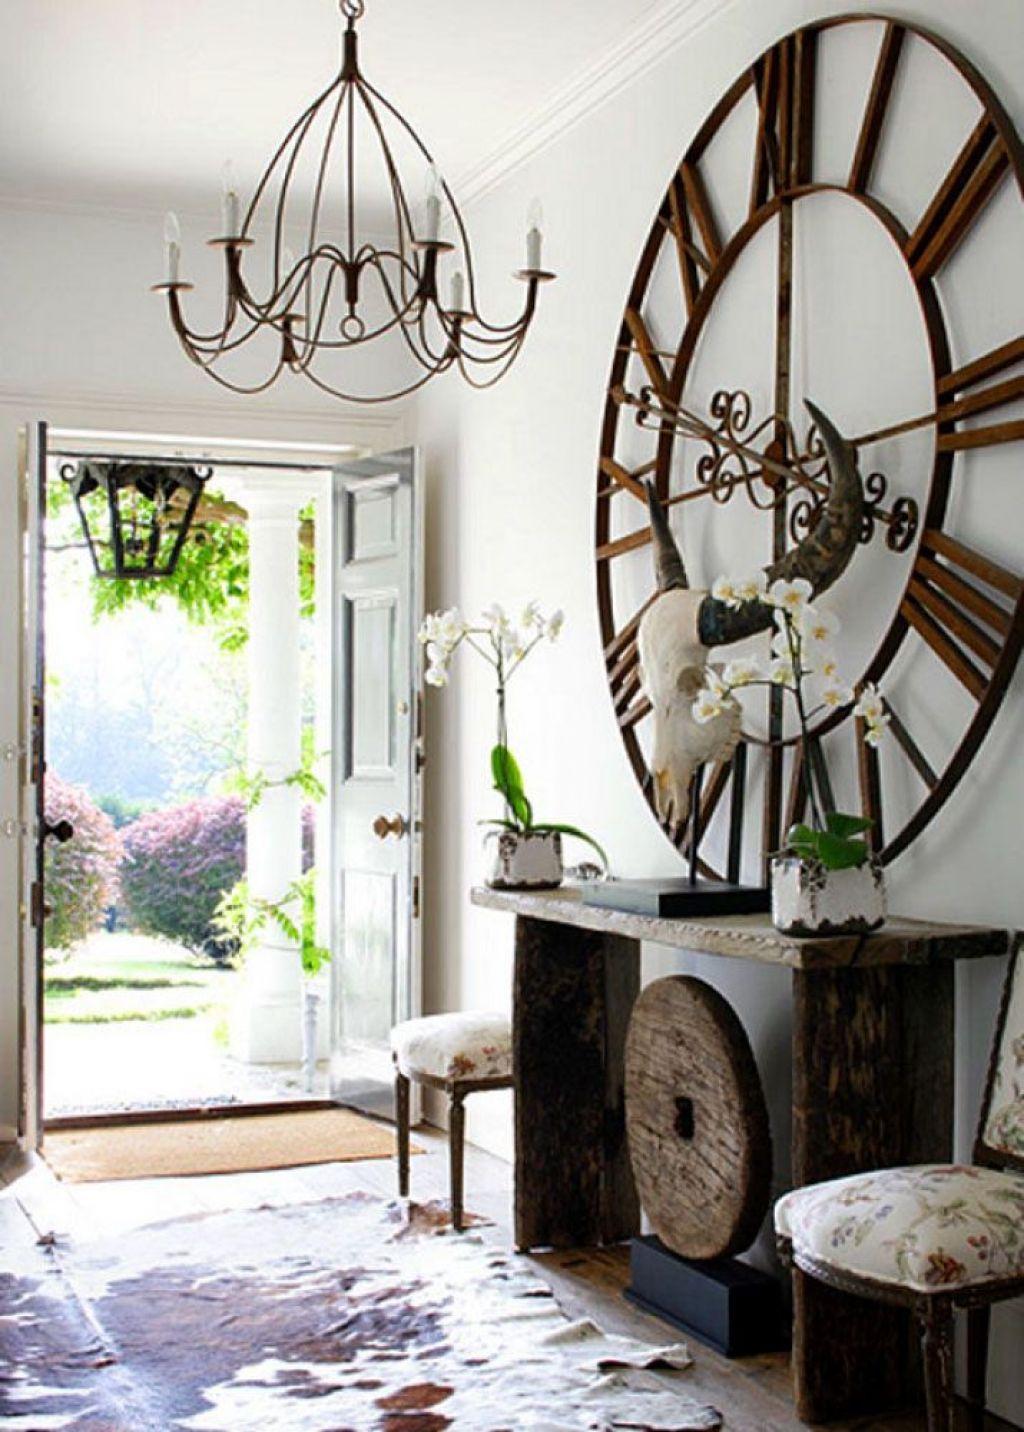 Ways To Hang Wall Clocks White Home Decor Chic Interior Shabby Chic Interiors